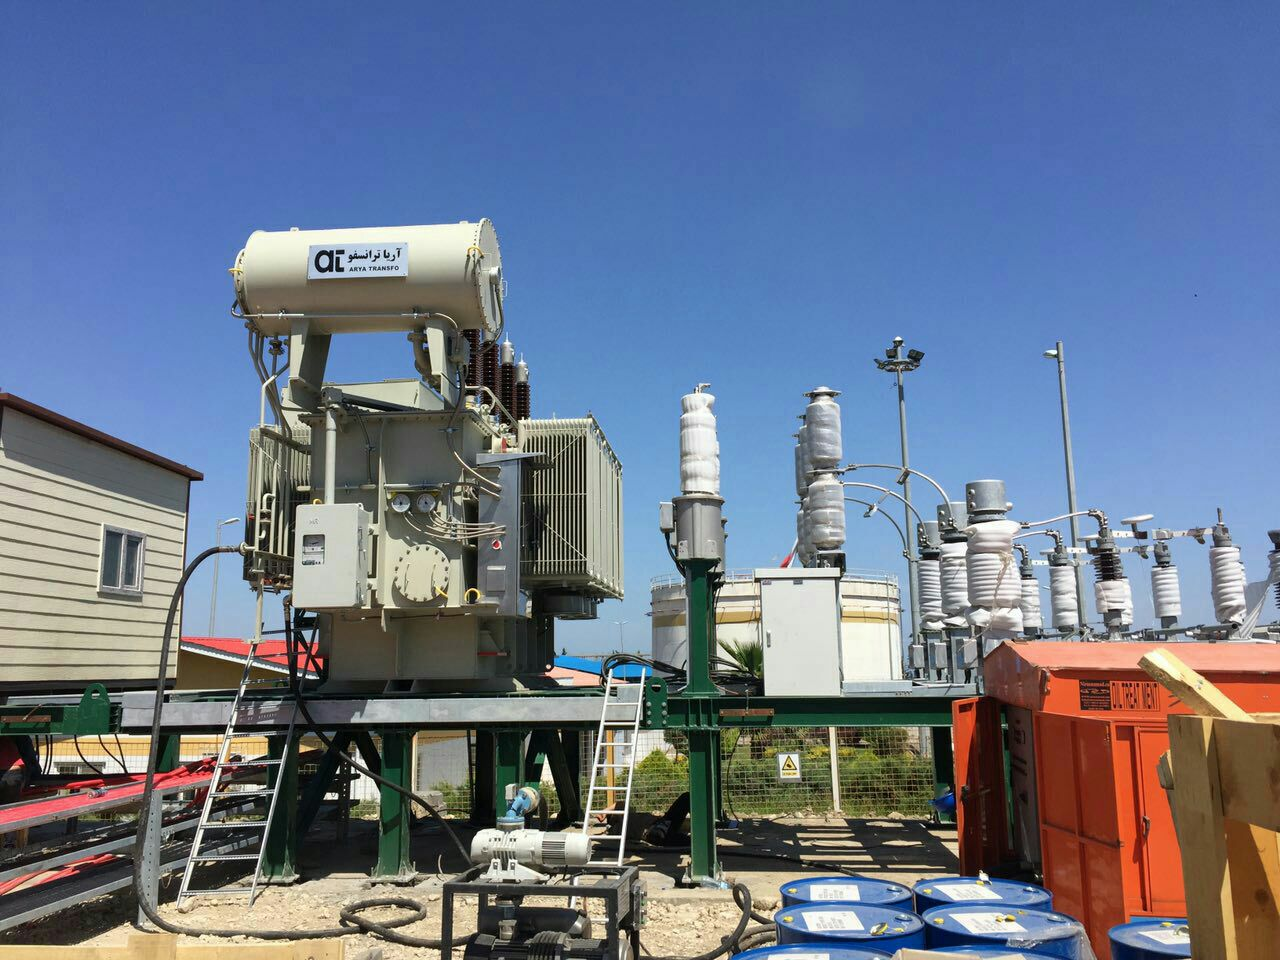 1 foghe tozie بزرگترین ترانس های قدرت برای پایداری برق خوزستان خریداری شدند